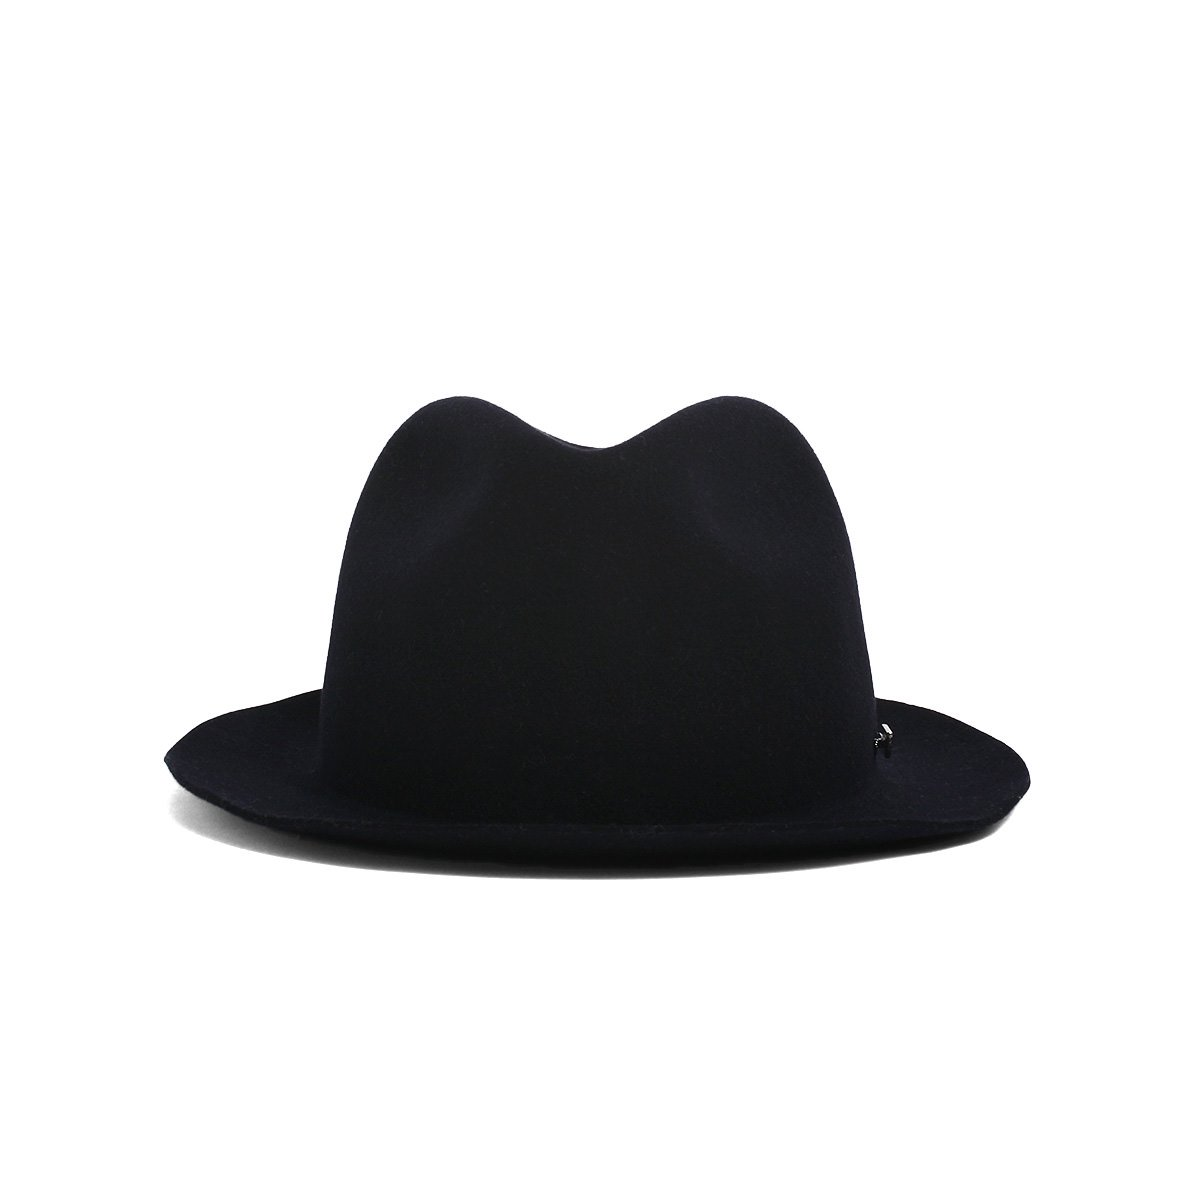 NOMAD FELT HAT SHORT 詳細画像2